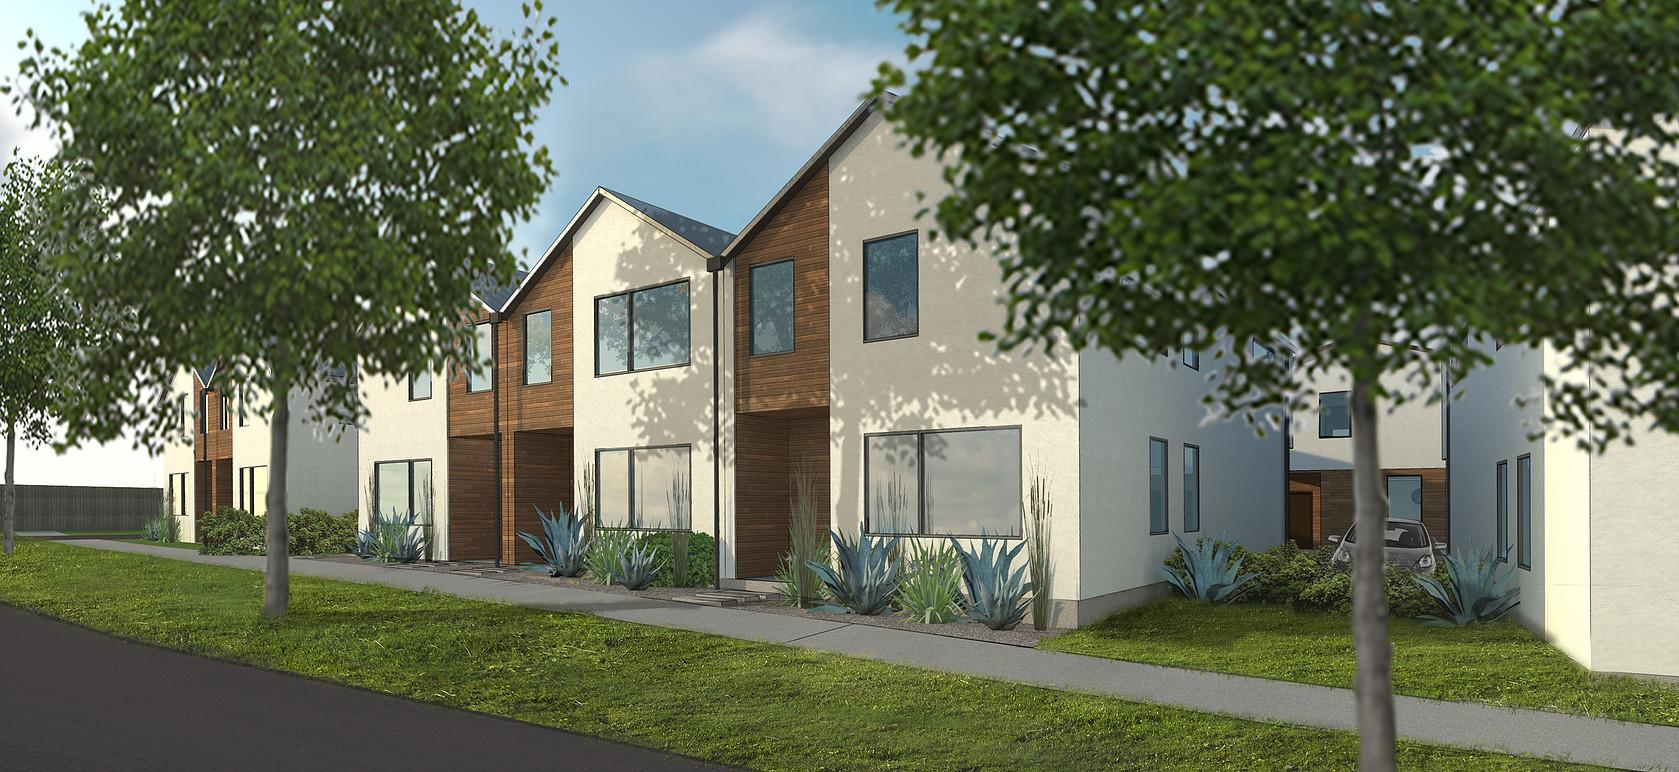 100 Affordable Modern Homes Austin Tx Affordable Austin